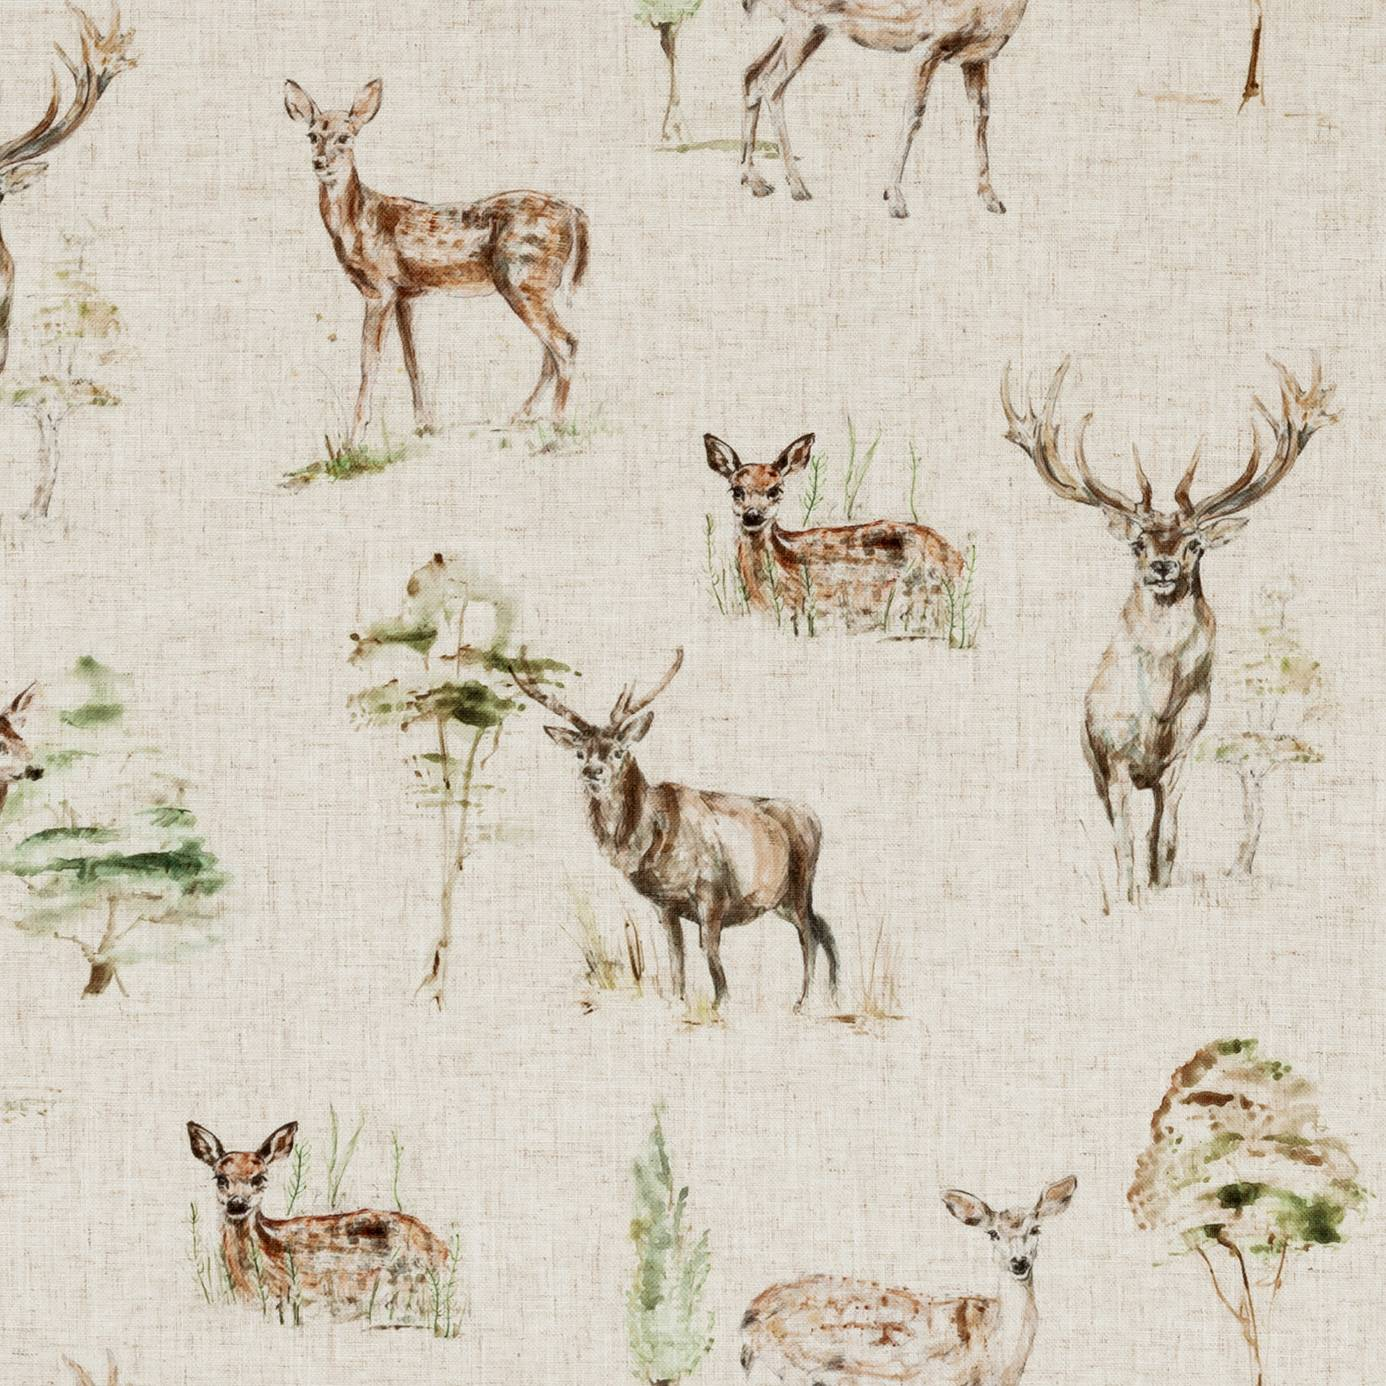 Deer Fabric Linen F0862 01 Studio G Countryside